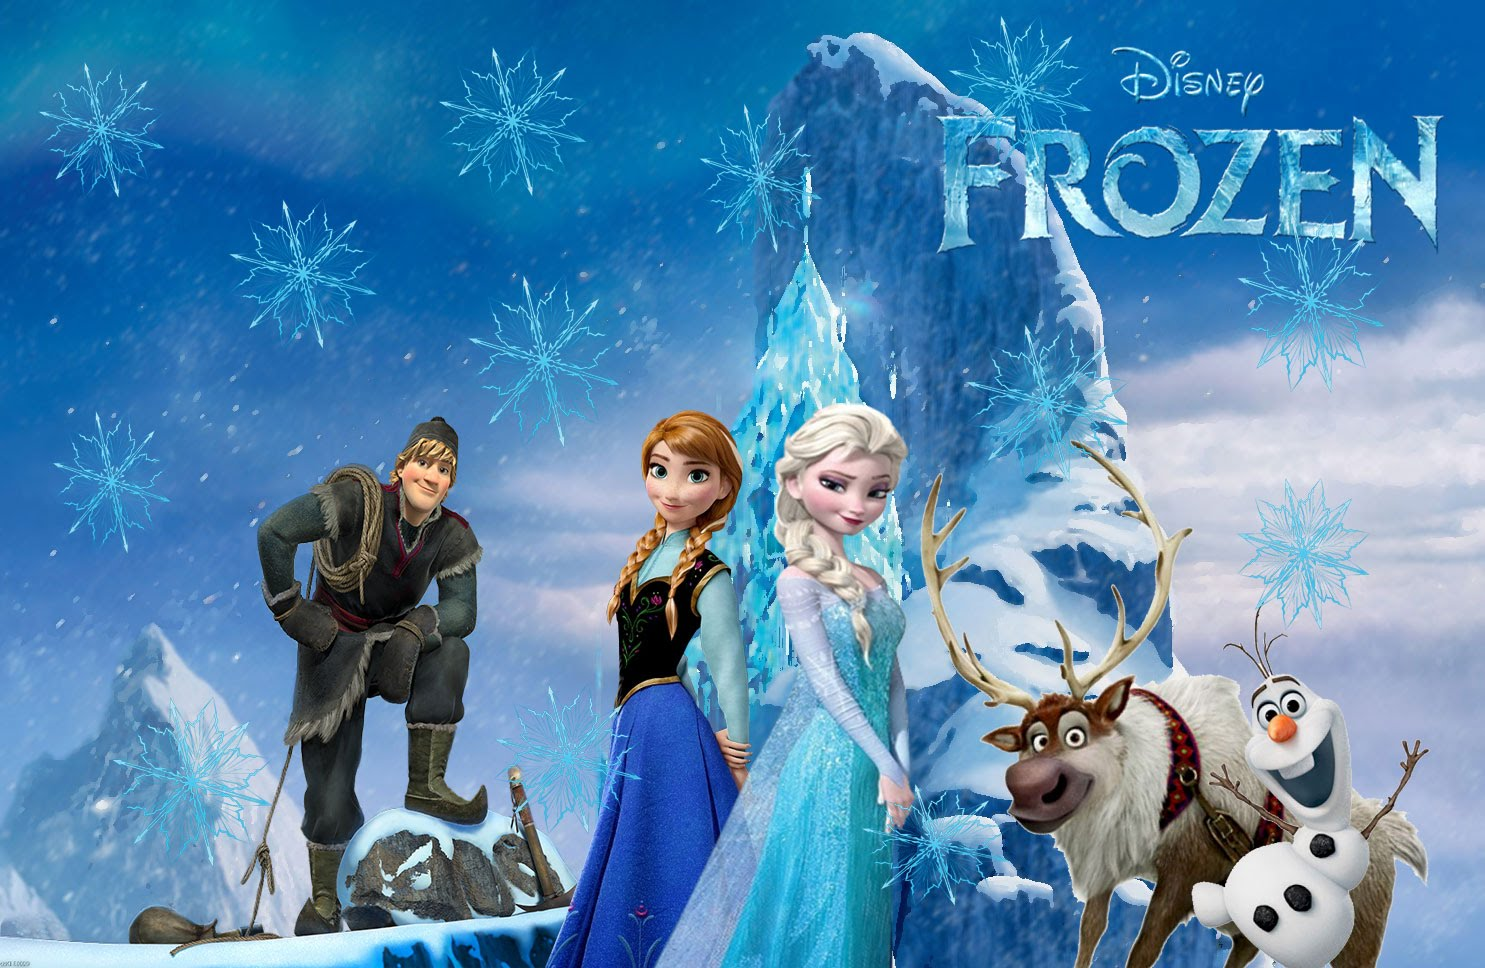 frozen full movie hd download